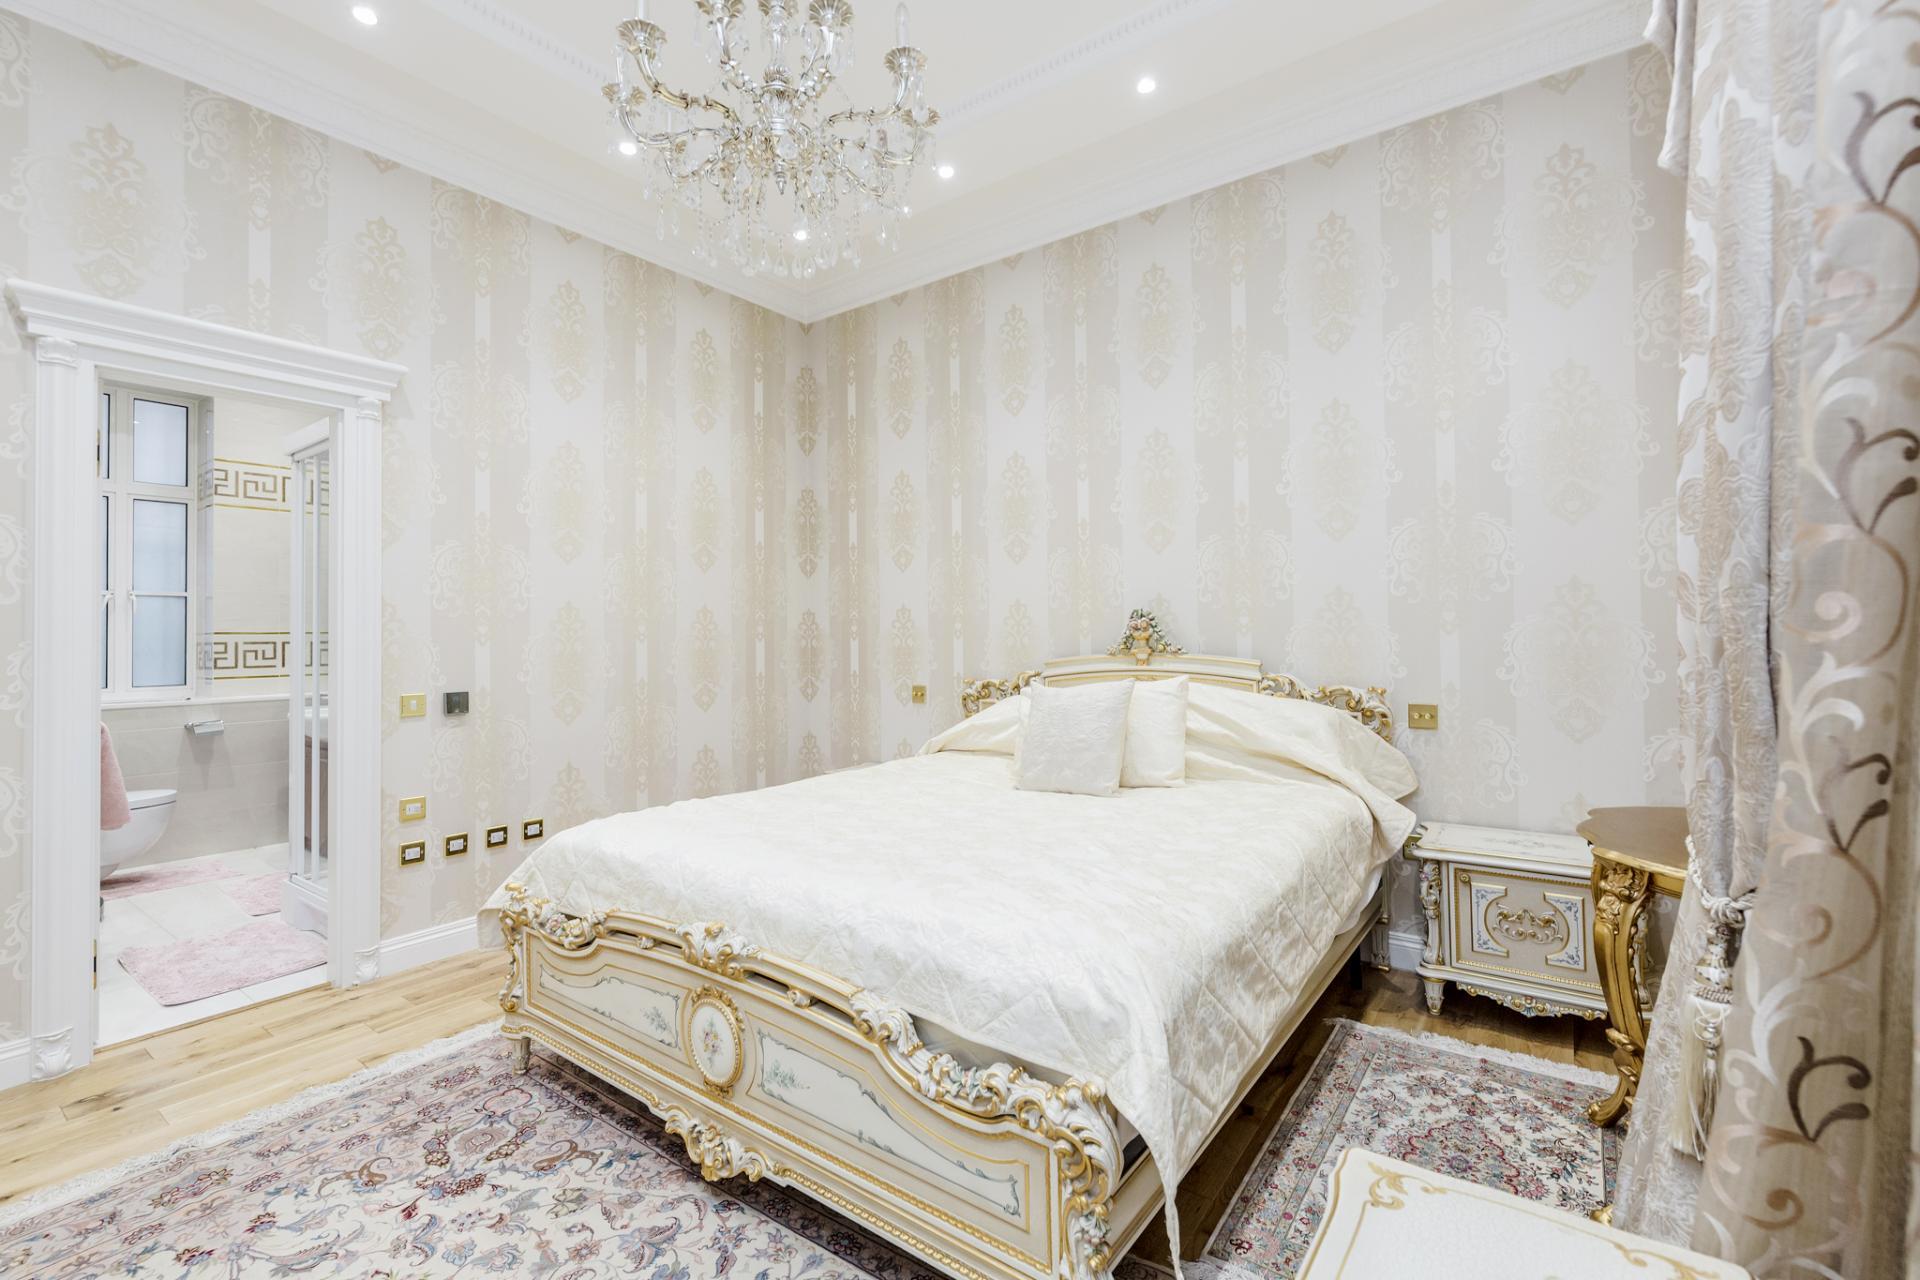 Bedroom at Grosvenor Square Apartment, Mayfair, London